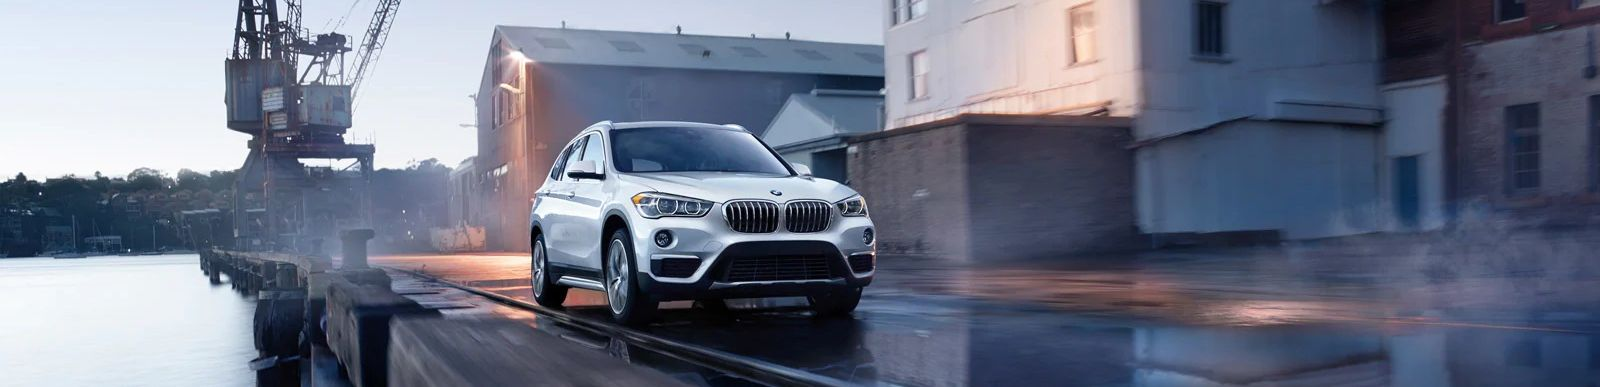 2019 BMW X1 for Sale near Valparaiso, IN